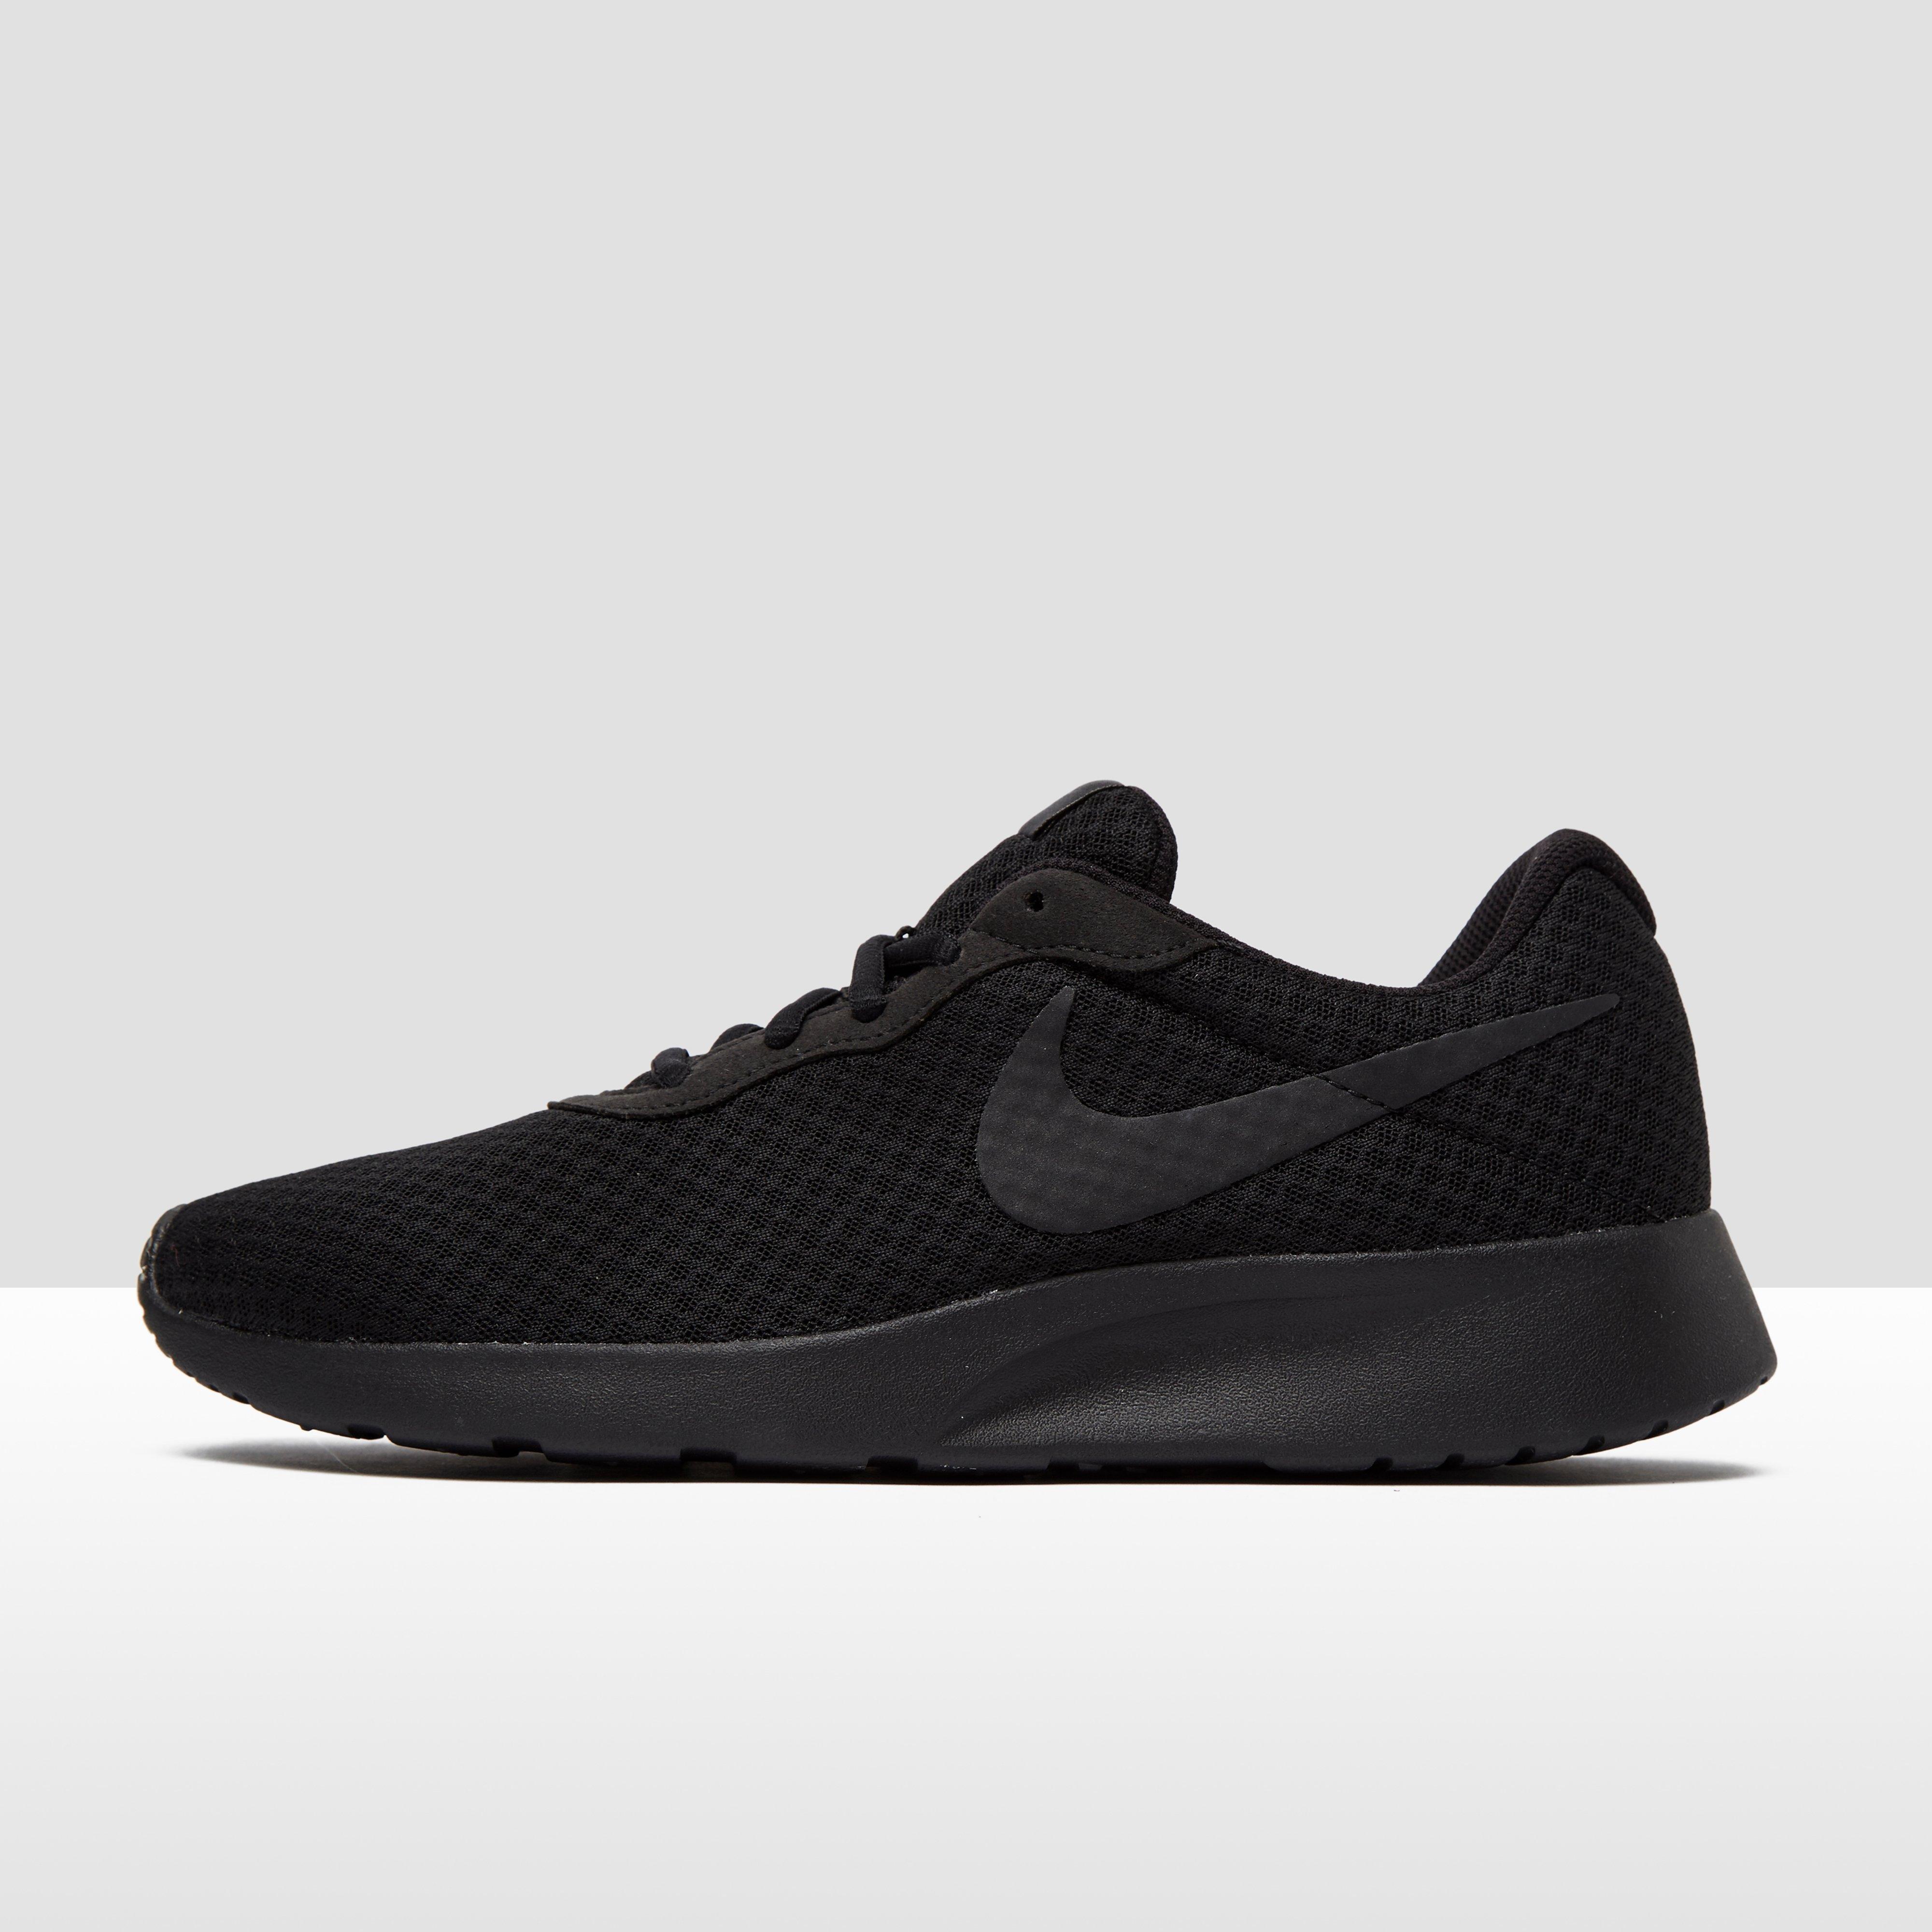 Tanjun Chaussures Noir Nike Pour Les Hommes pQROuI